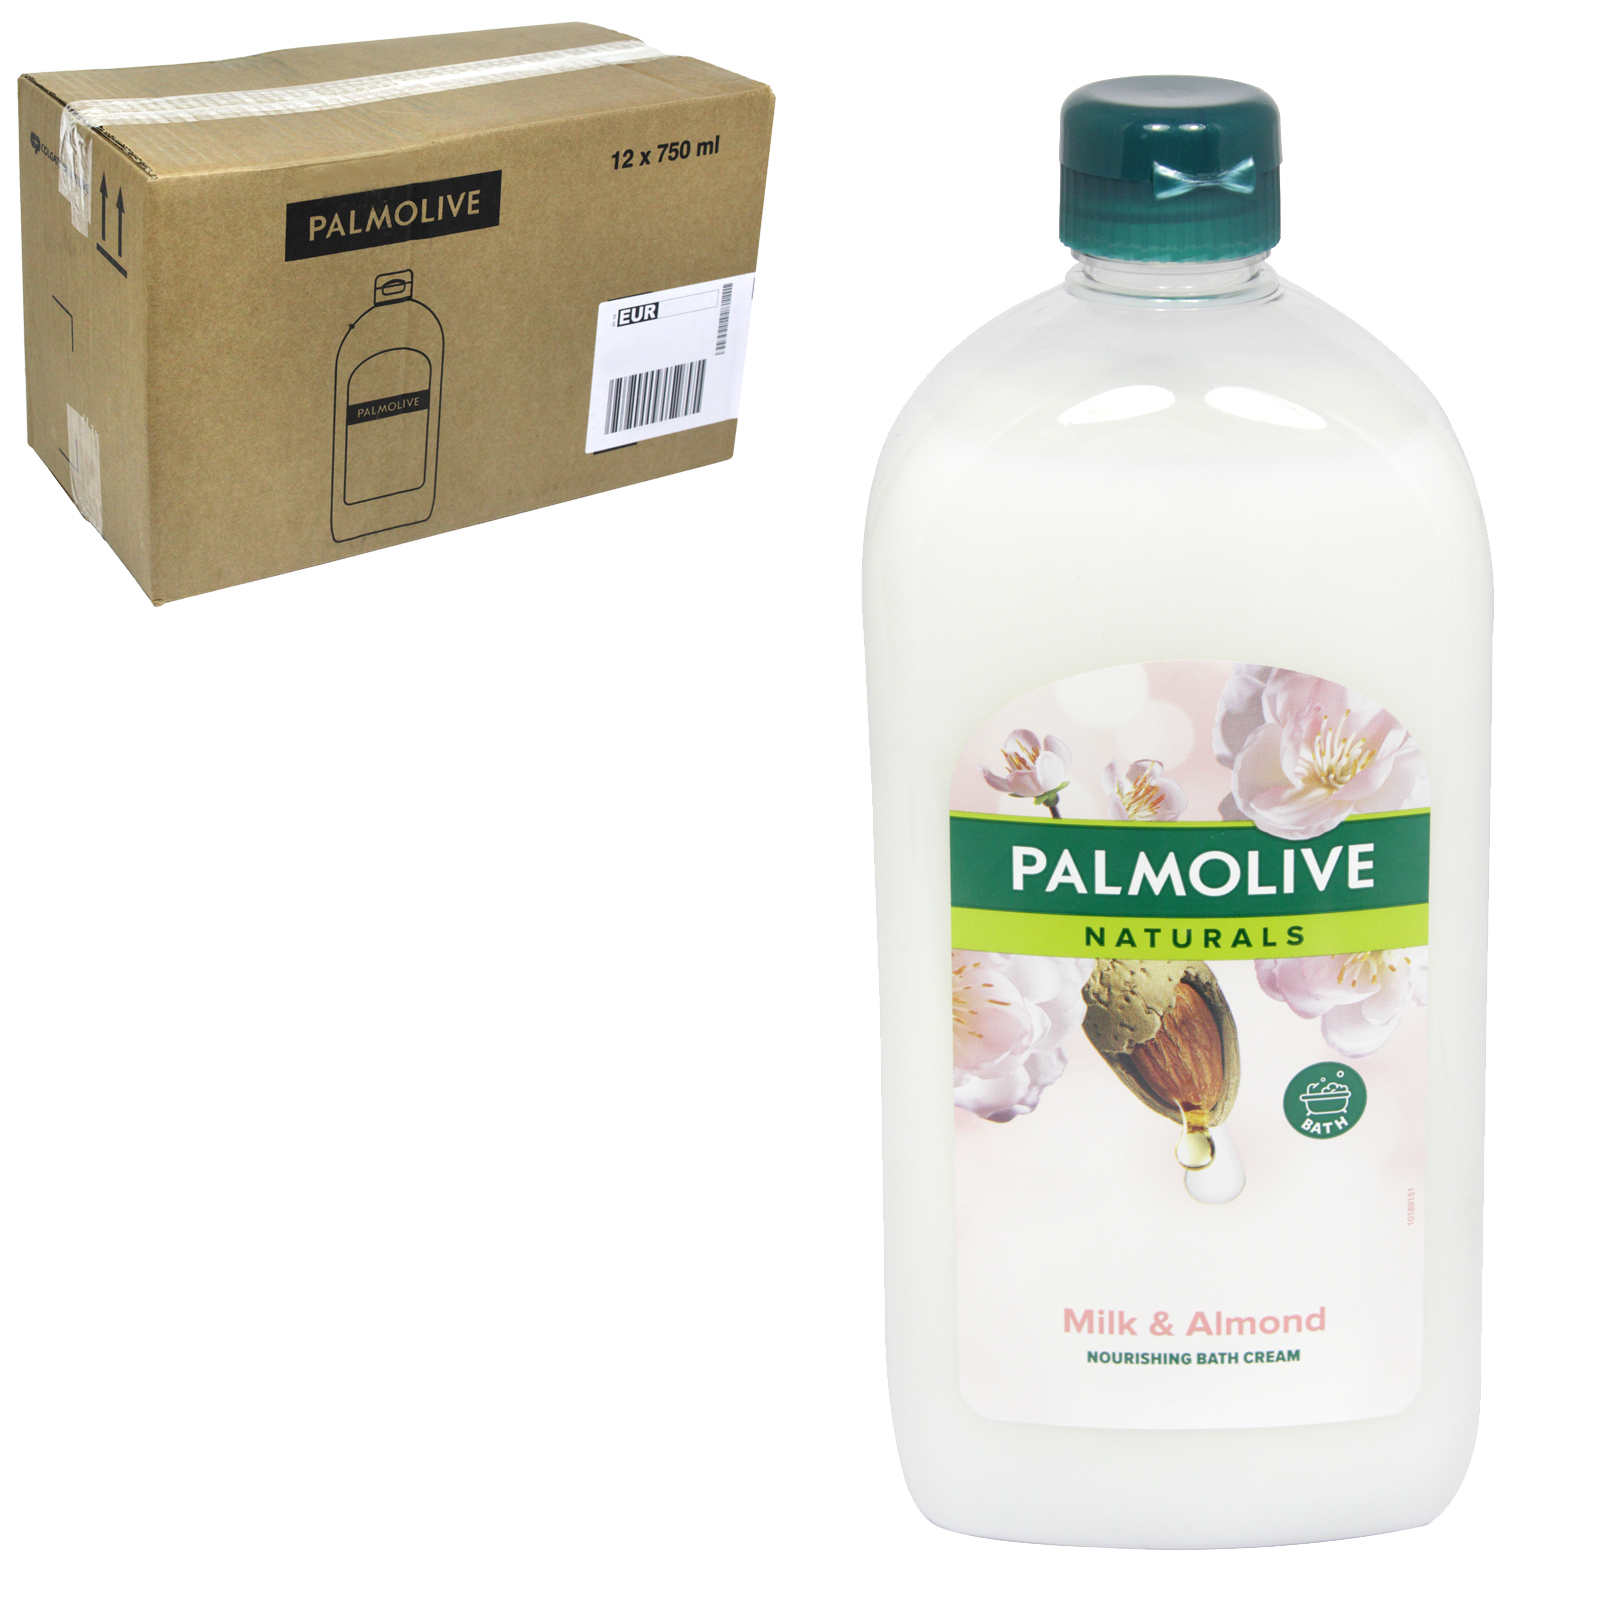 PALMOLIVE NATURALS NOURISHING BATH CREAM 750ML MILK+ALMOND X12